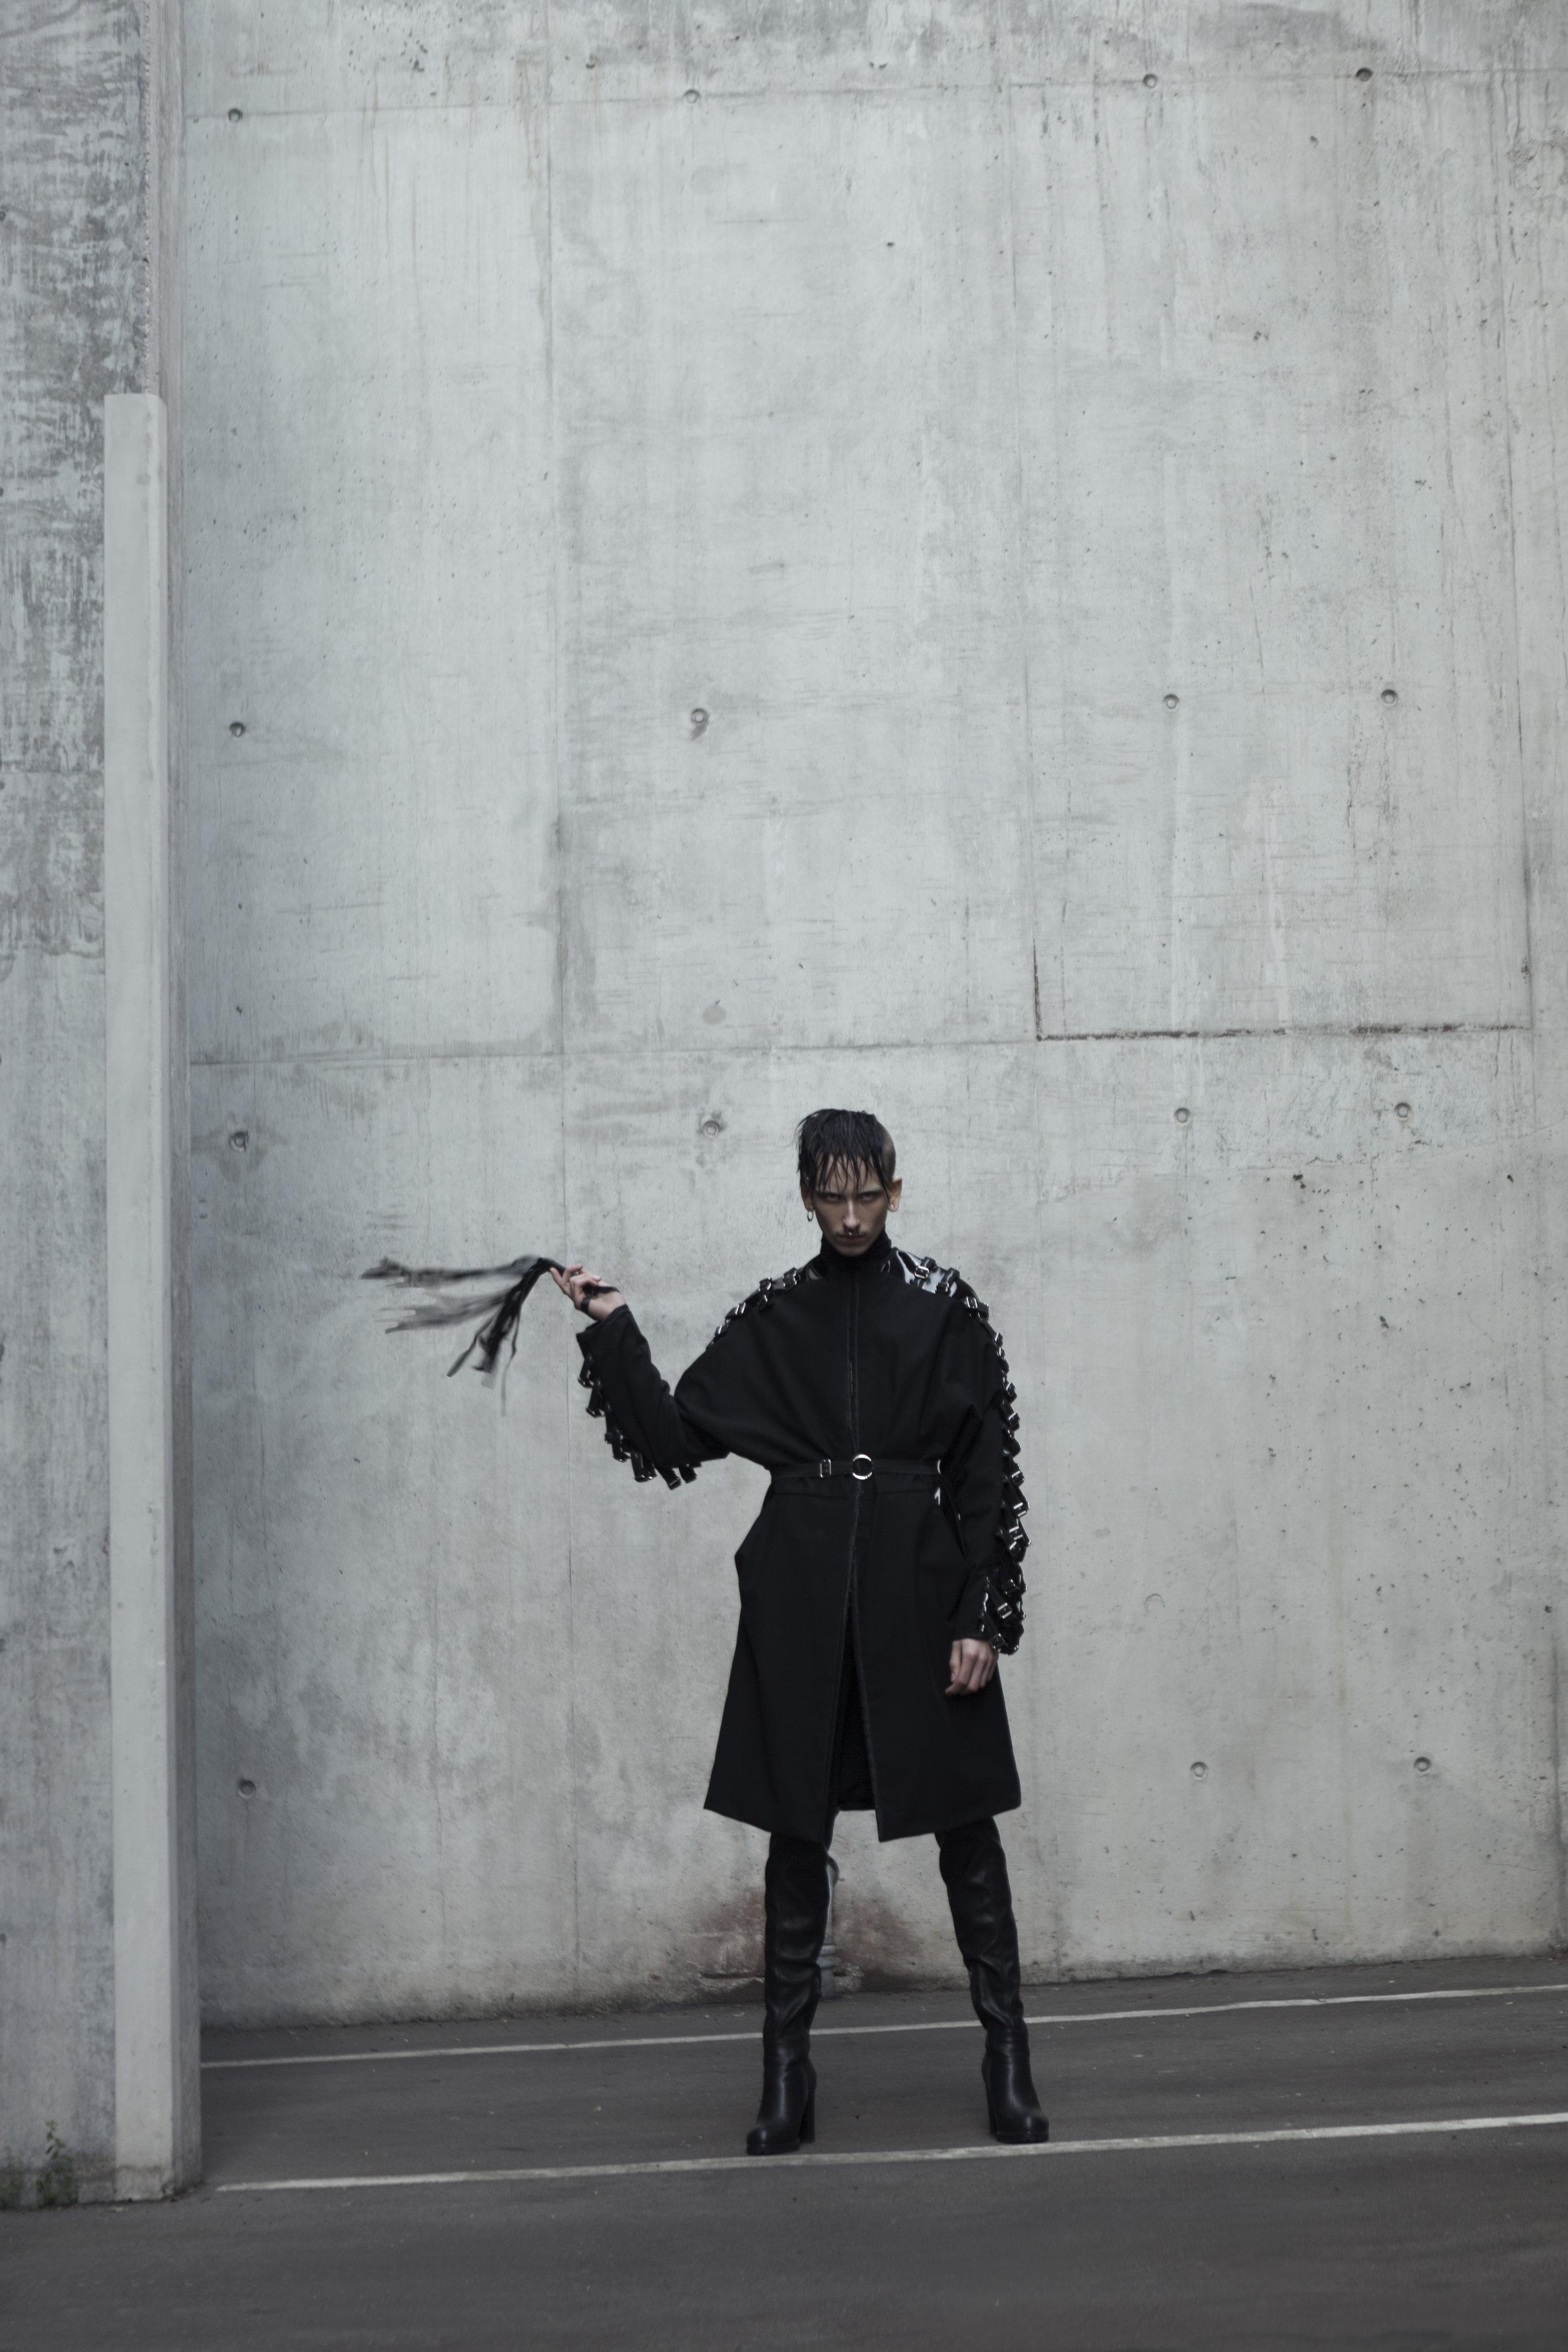 coat-mantel-lack-ebru-berkiden-kleidung.jpg